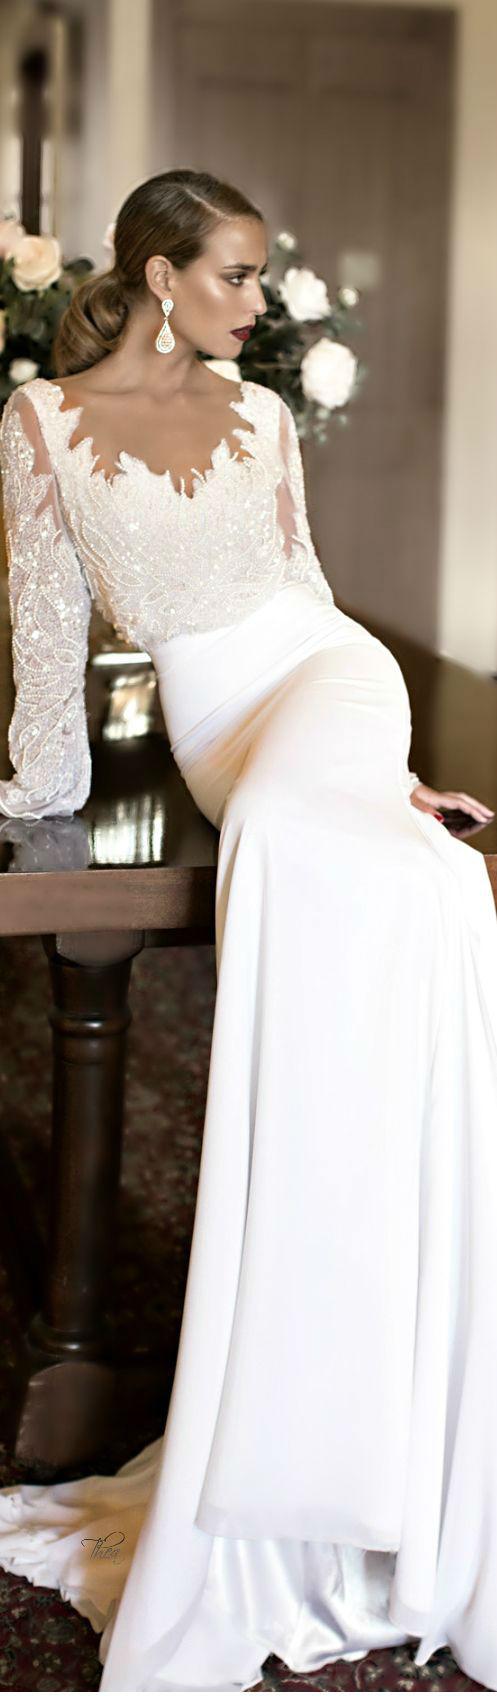 long-sleeve-wedding-dress31